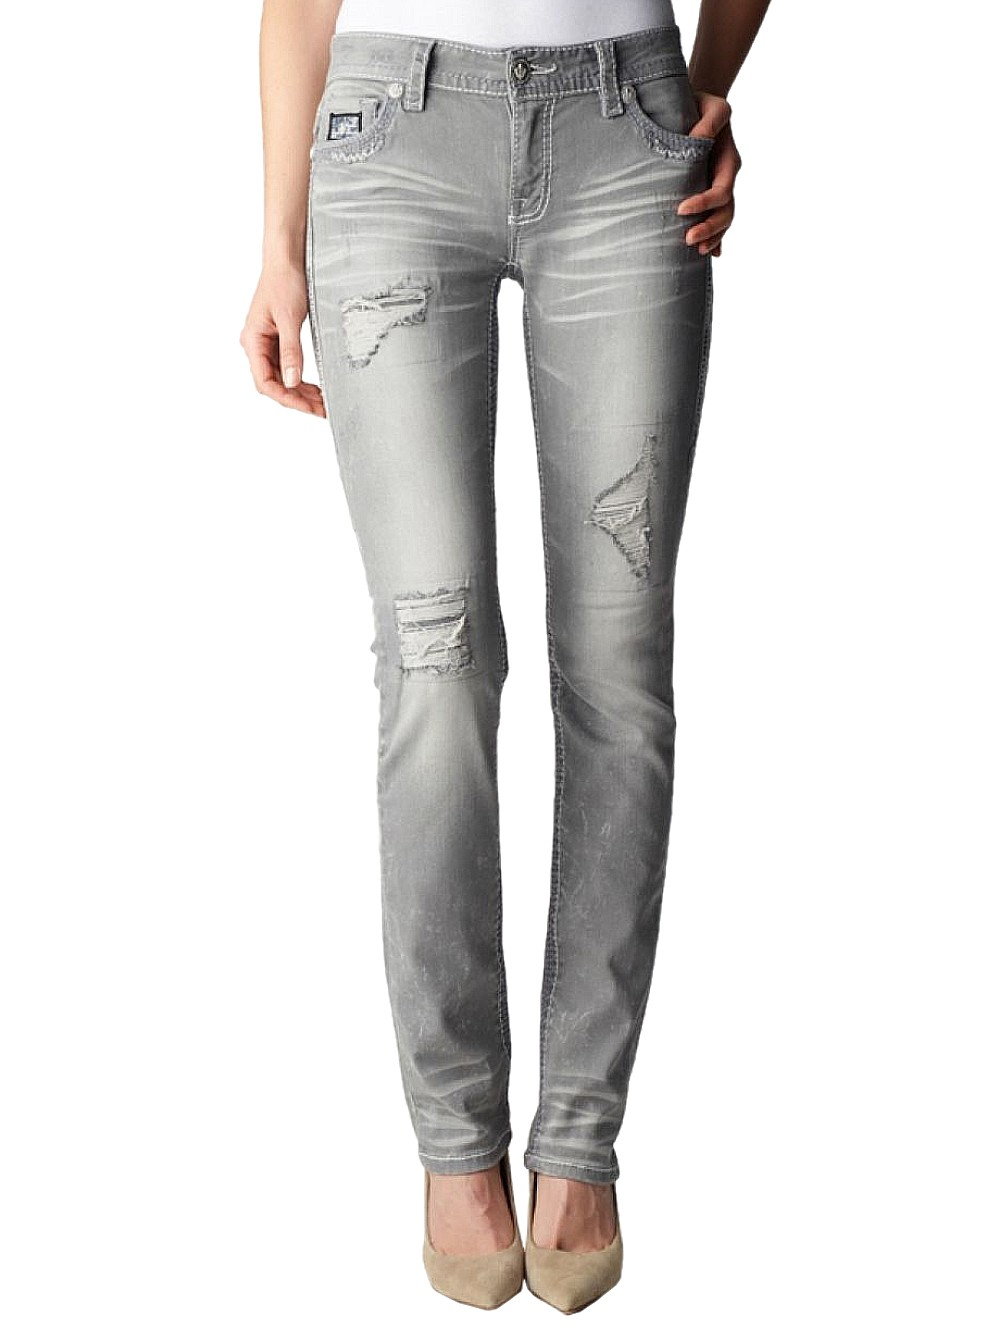 Jeans Grau. sublevel herren skinny jeans grau. straight fit